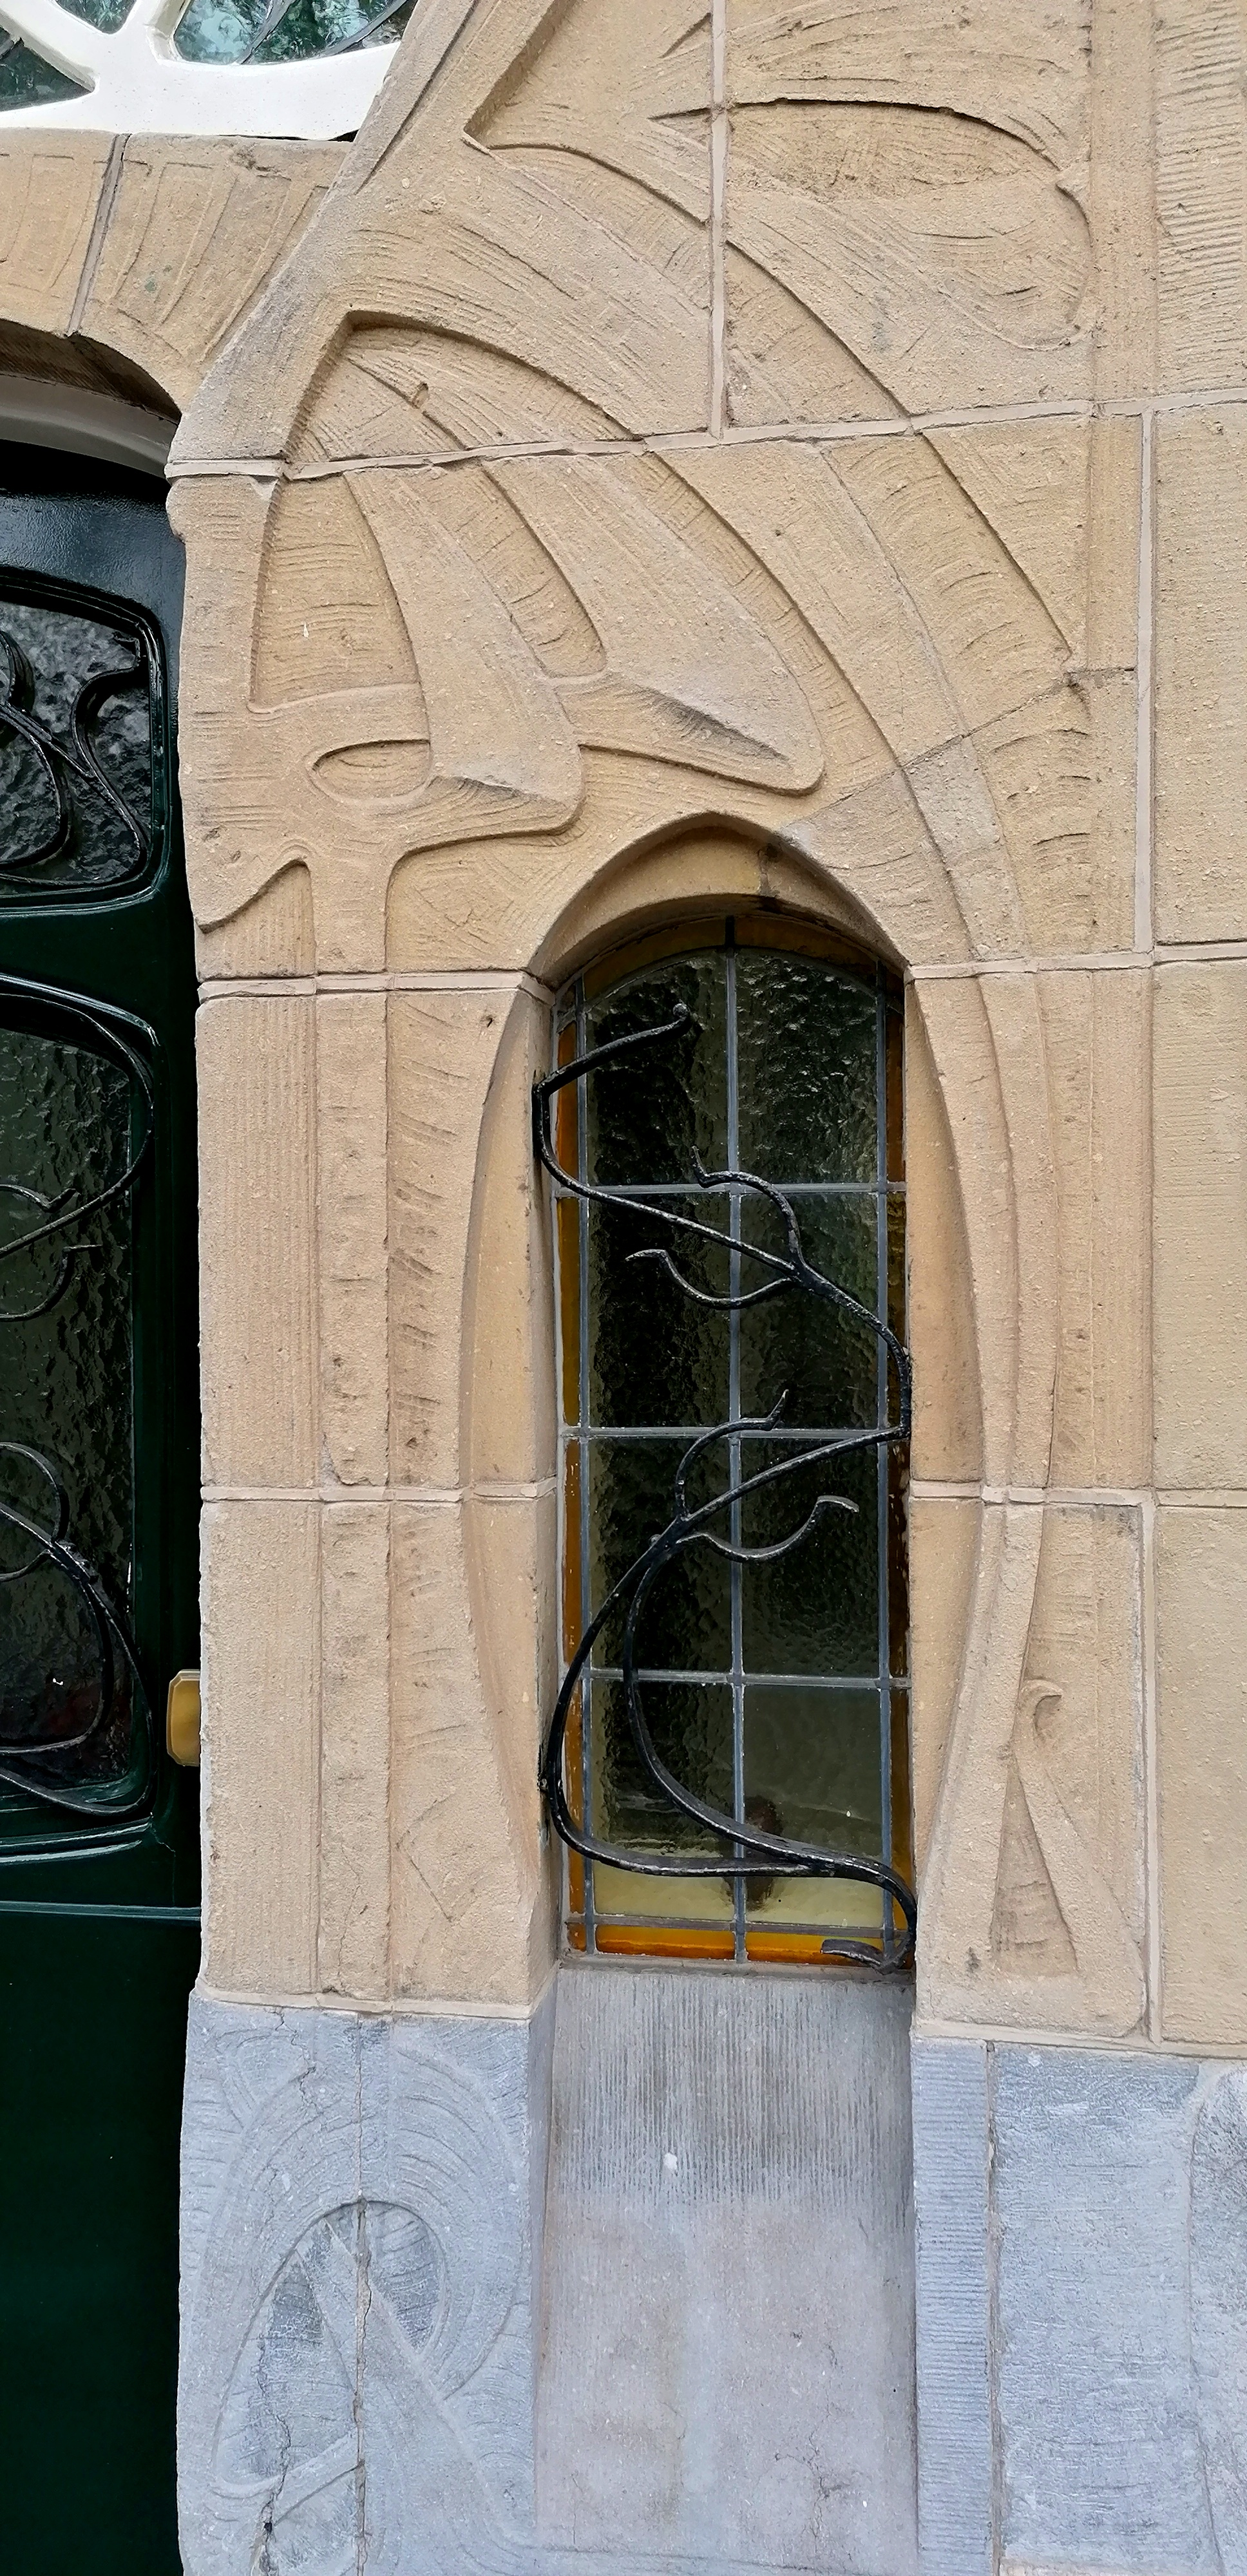 gevelversiering en raam bij deur jugendstil art nouveau huis aan Laan van Meerdervoort nr. 215 Den Haag